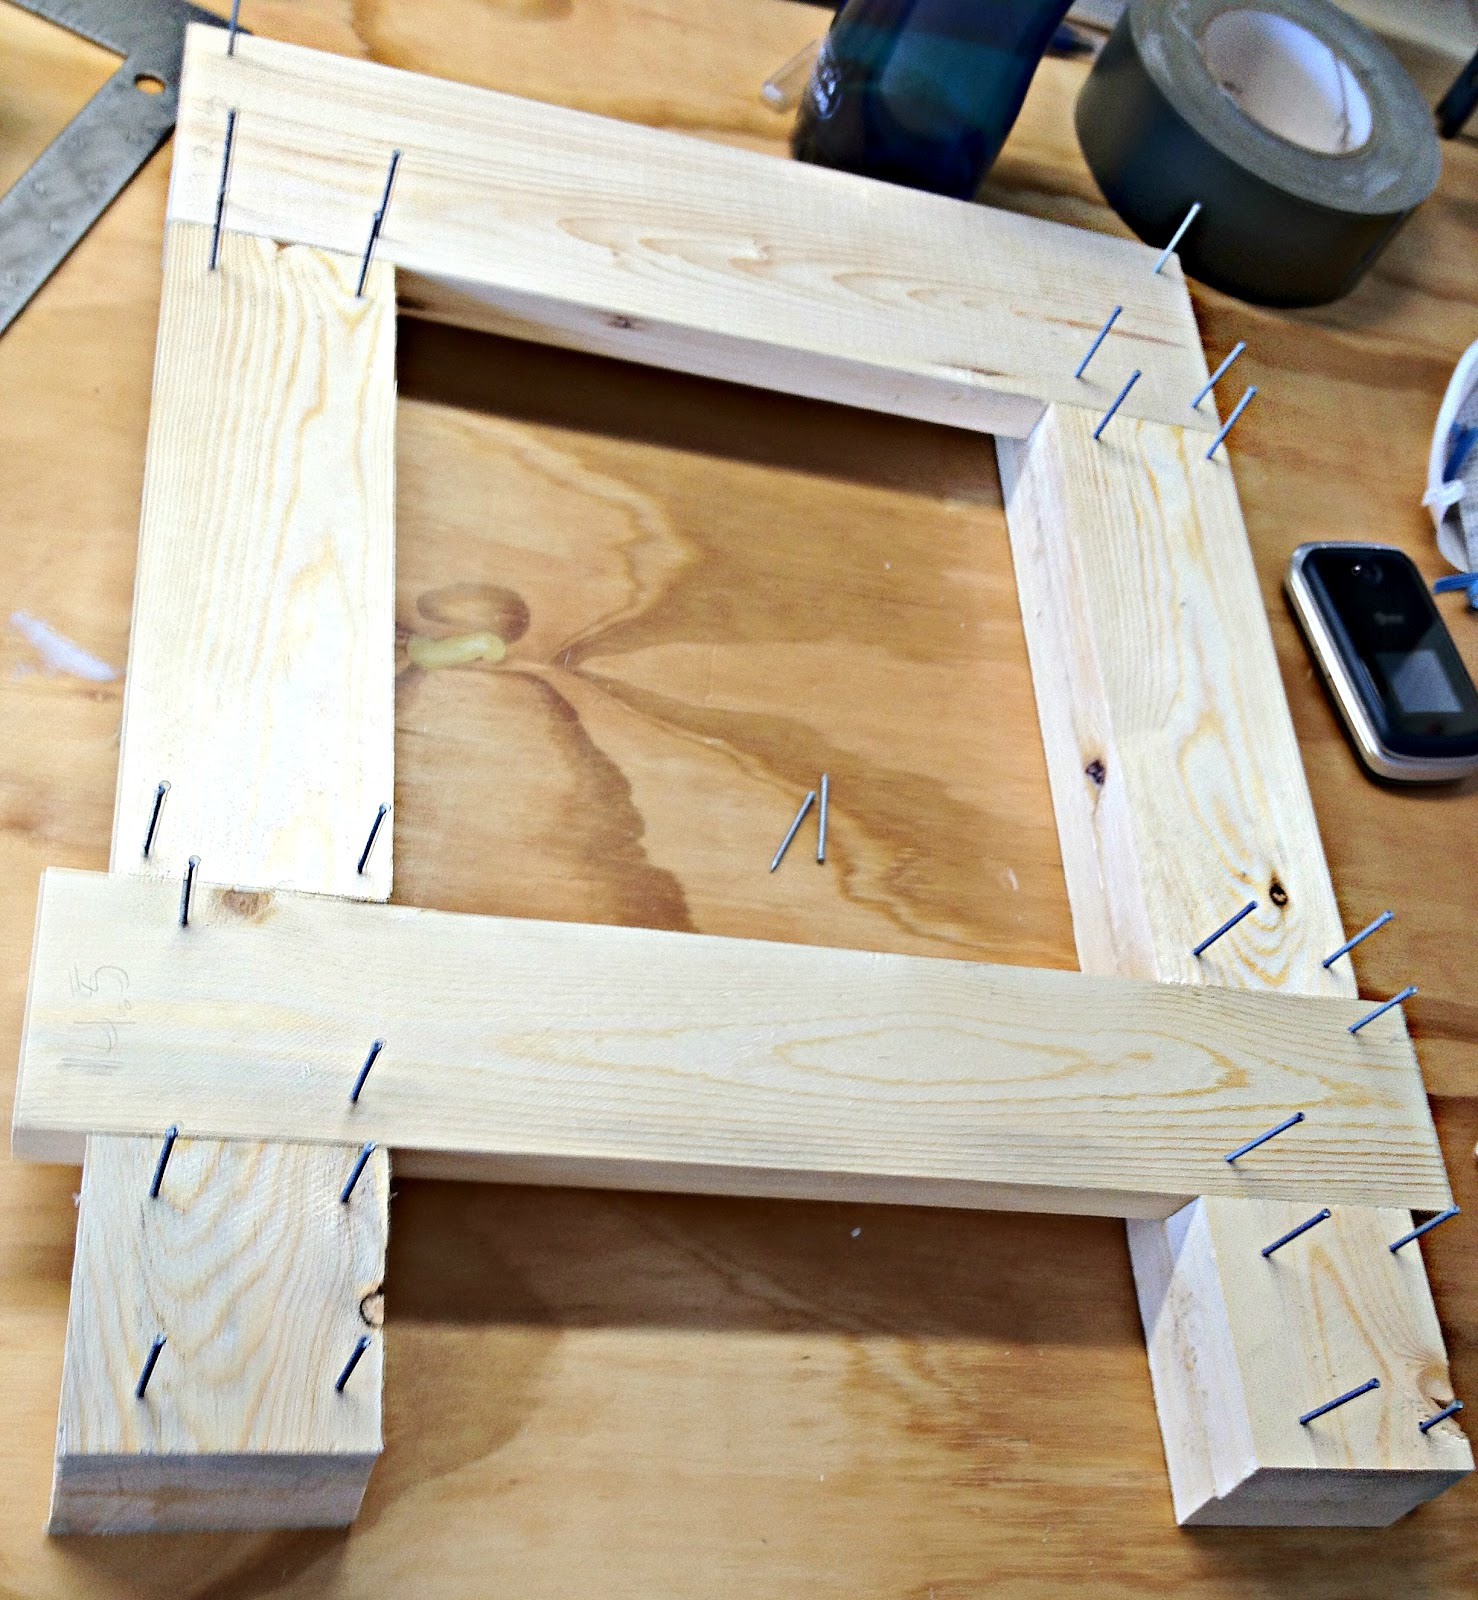 Finishing+nails+step+1+legpottery+barn+bench